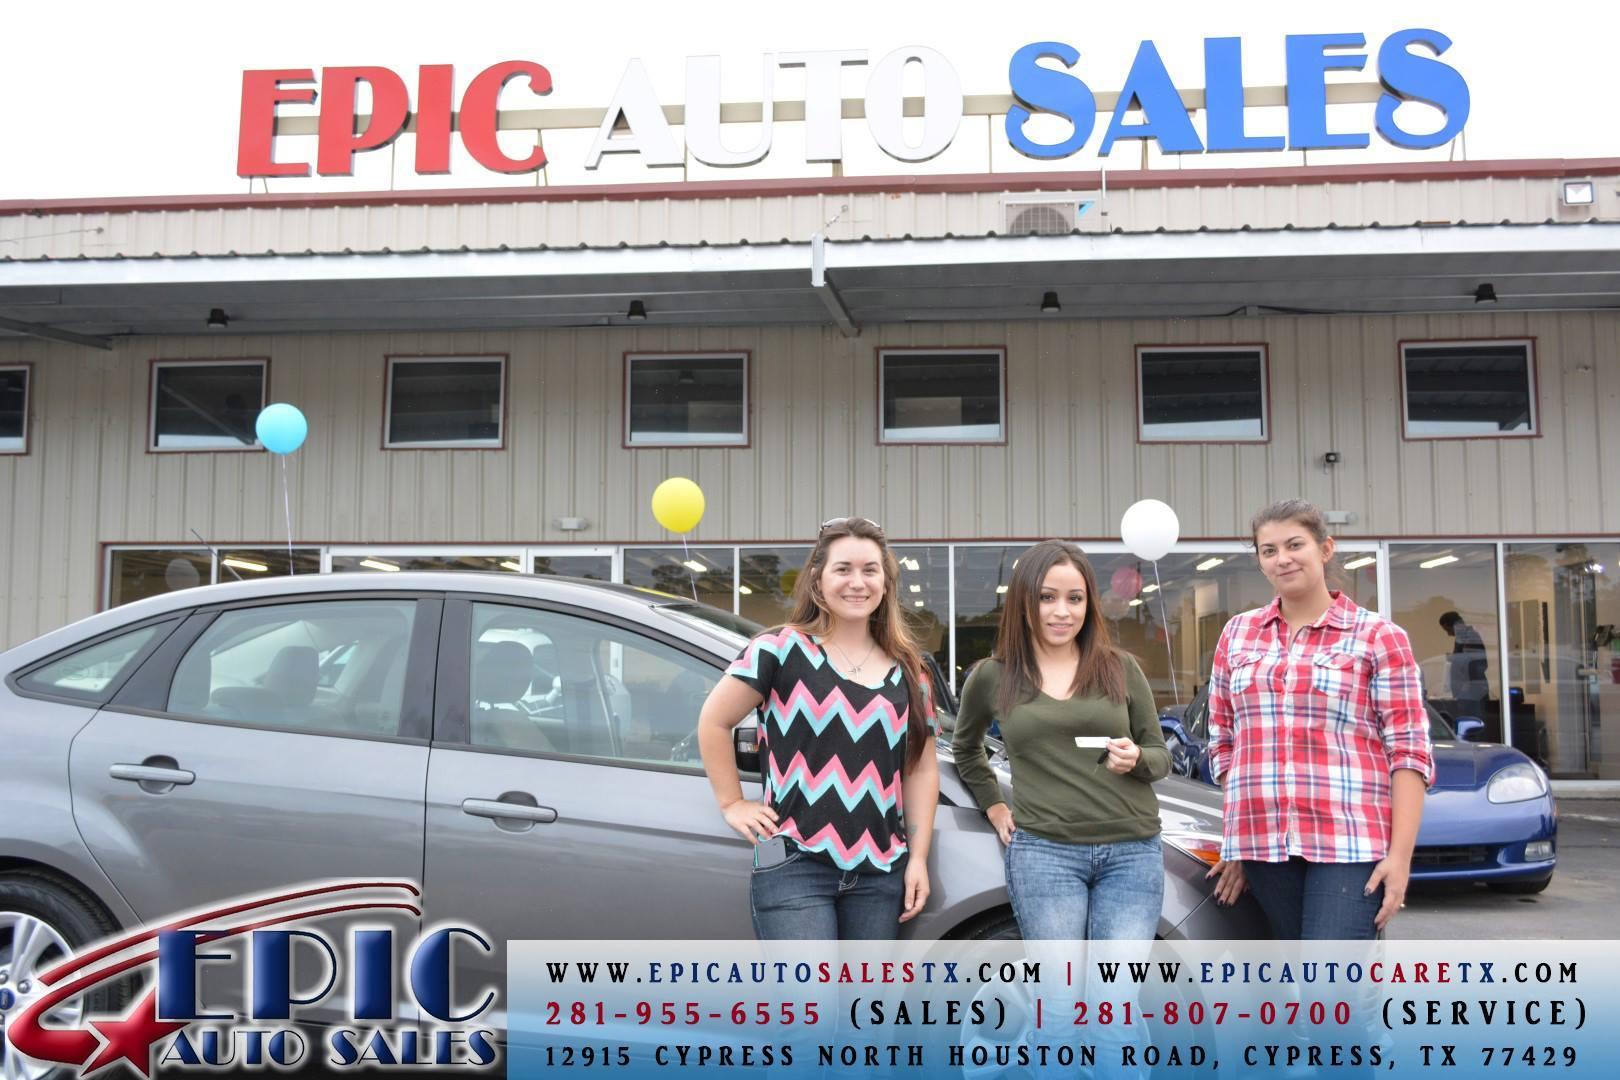 Epic Auto Sales image 10